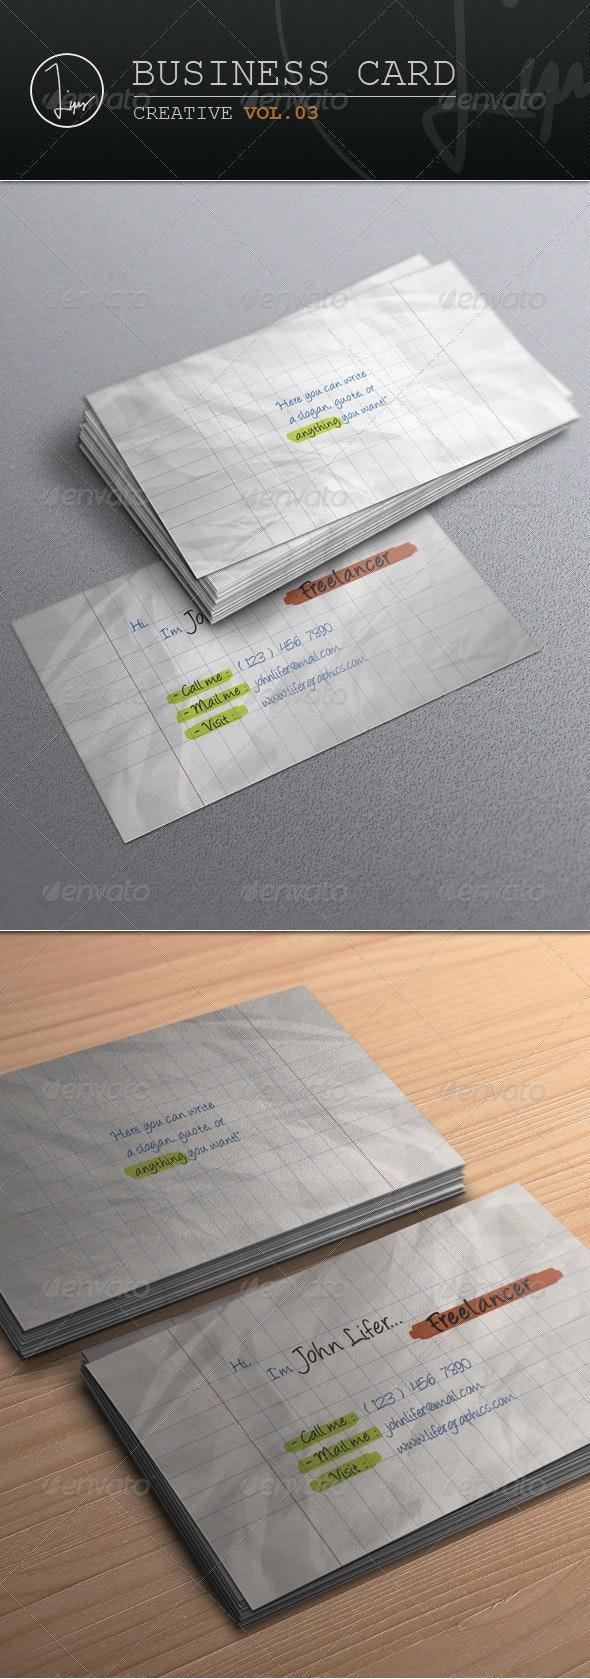 Business Card / Creative Vol.03 - Creative Business Cards